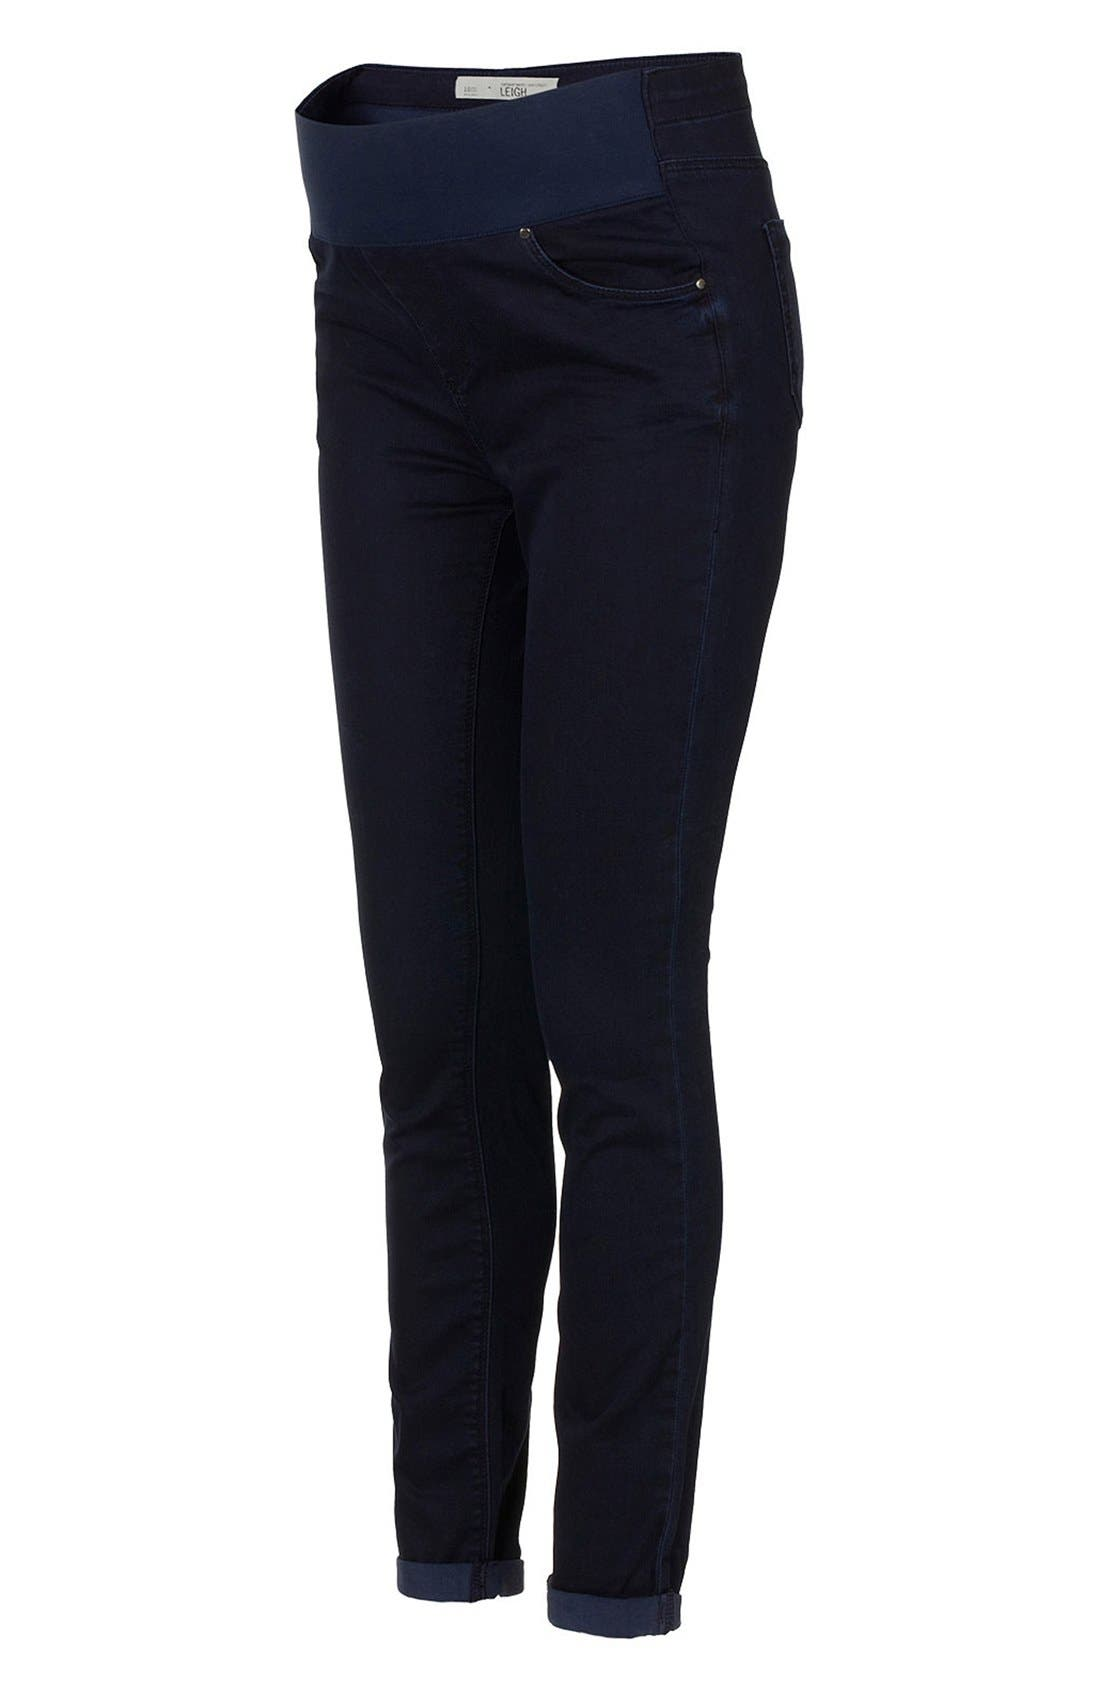 Alternate Image 1 Selected - Topshop Moto 'Leigh' Maternity Jeans (Indigo)